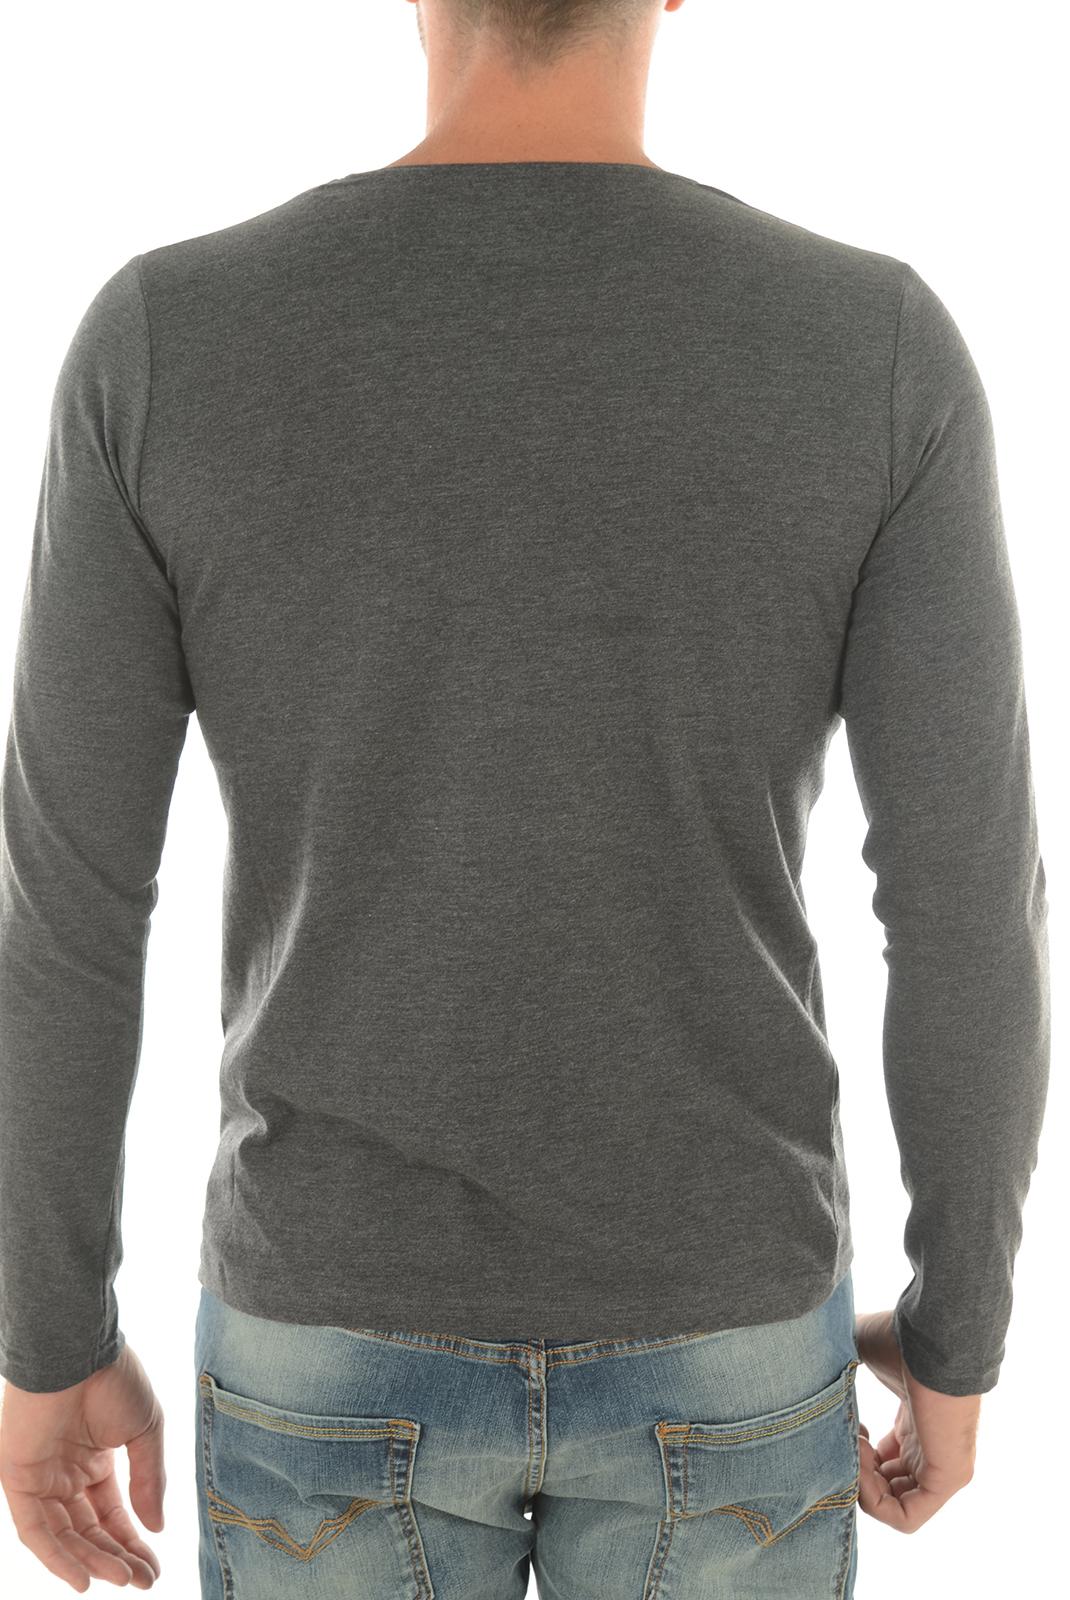 Tee-shirts  Biaggio jeans LEDANIL GRIS